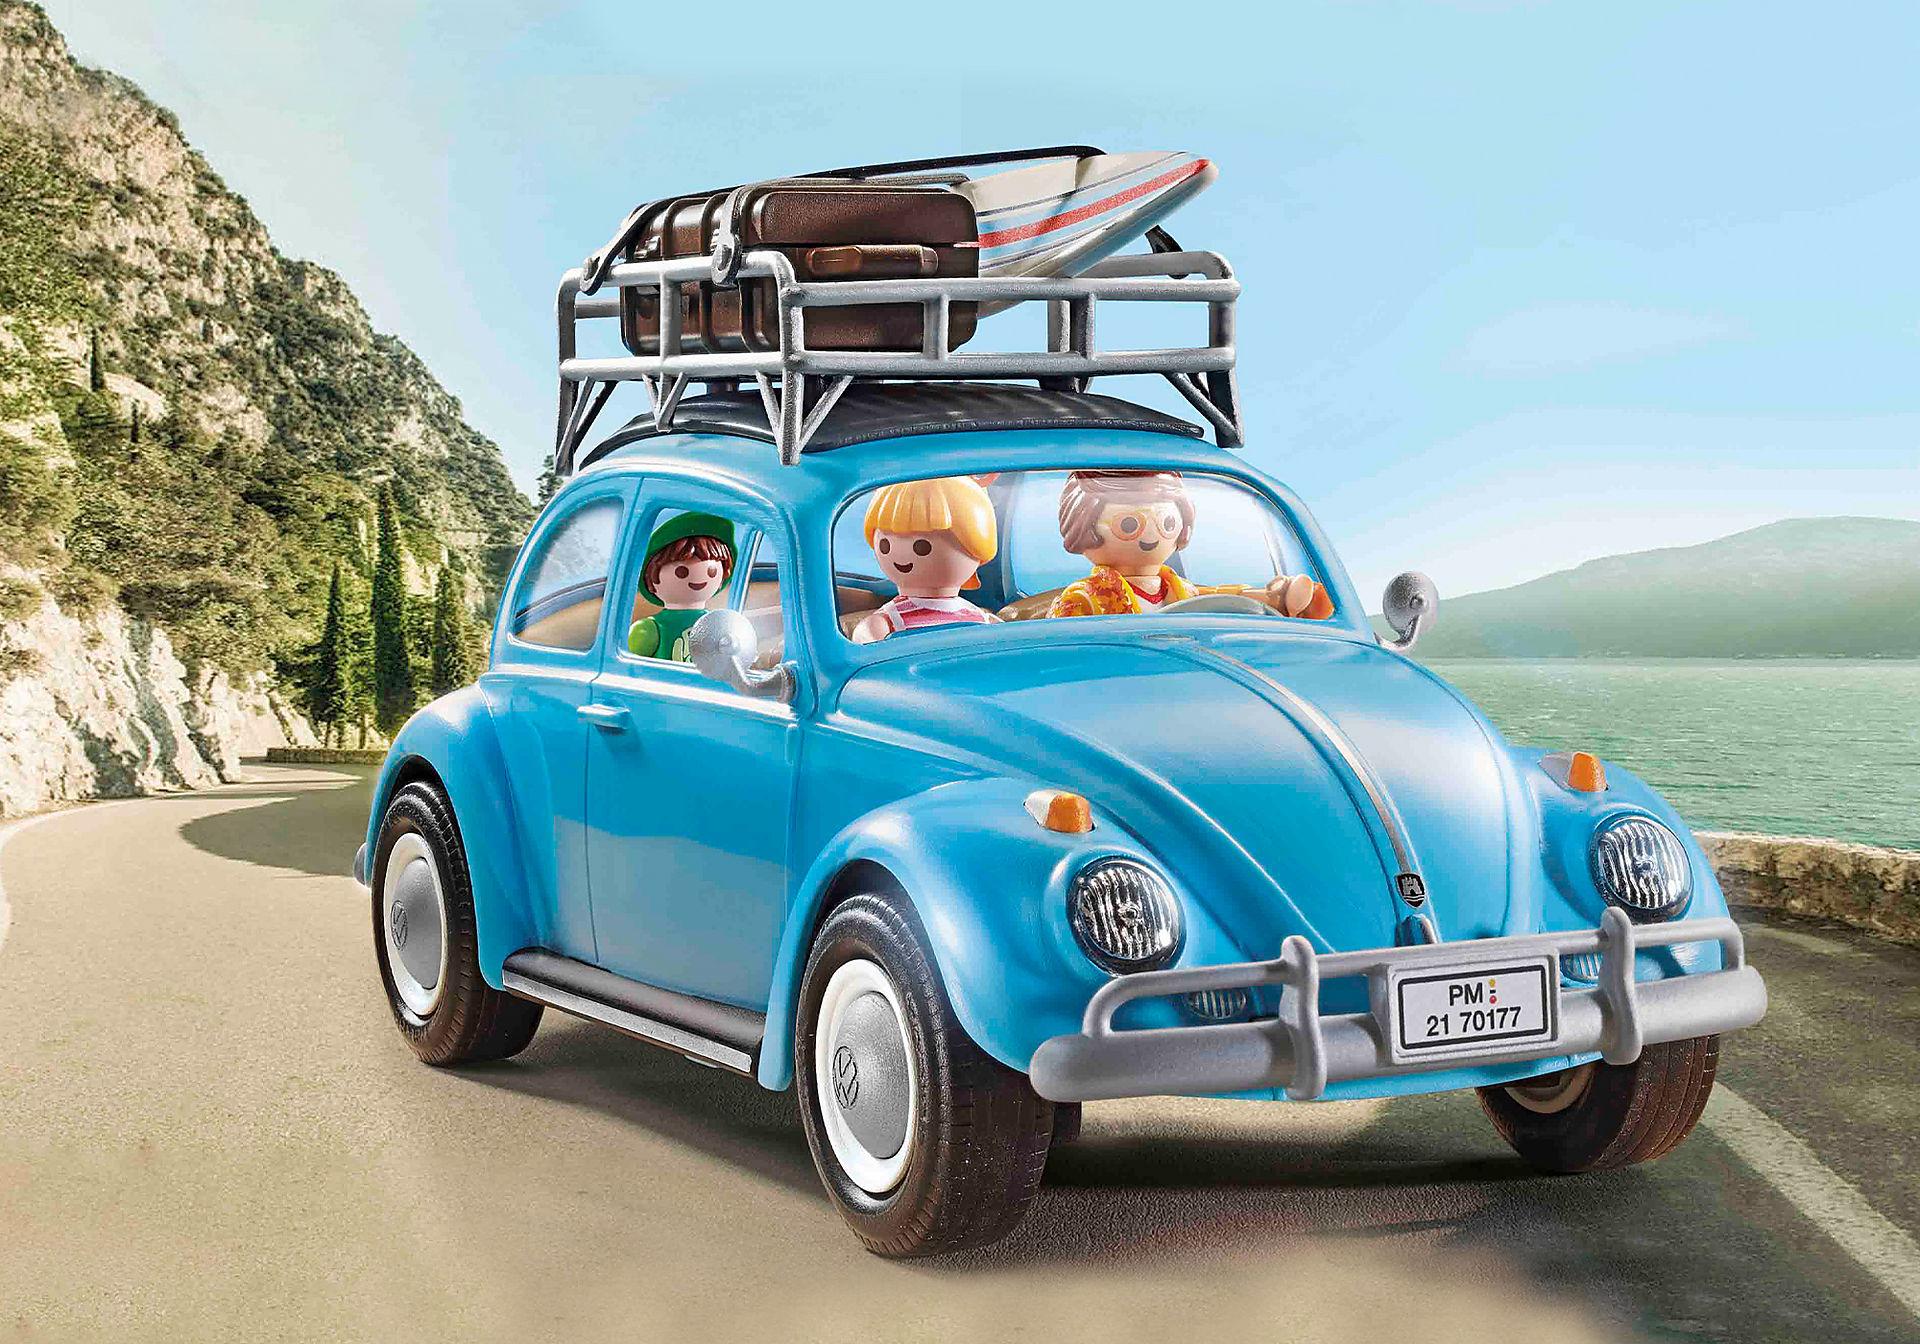 70177 Volkswagen Maggiolino zoom image1